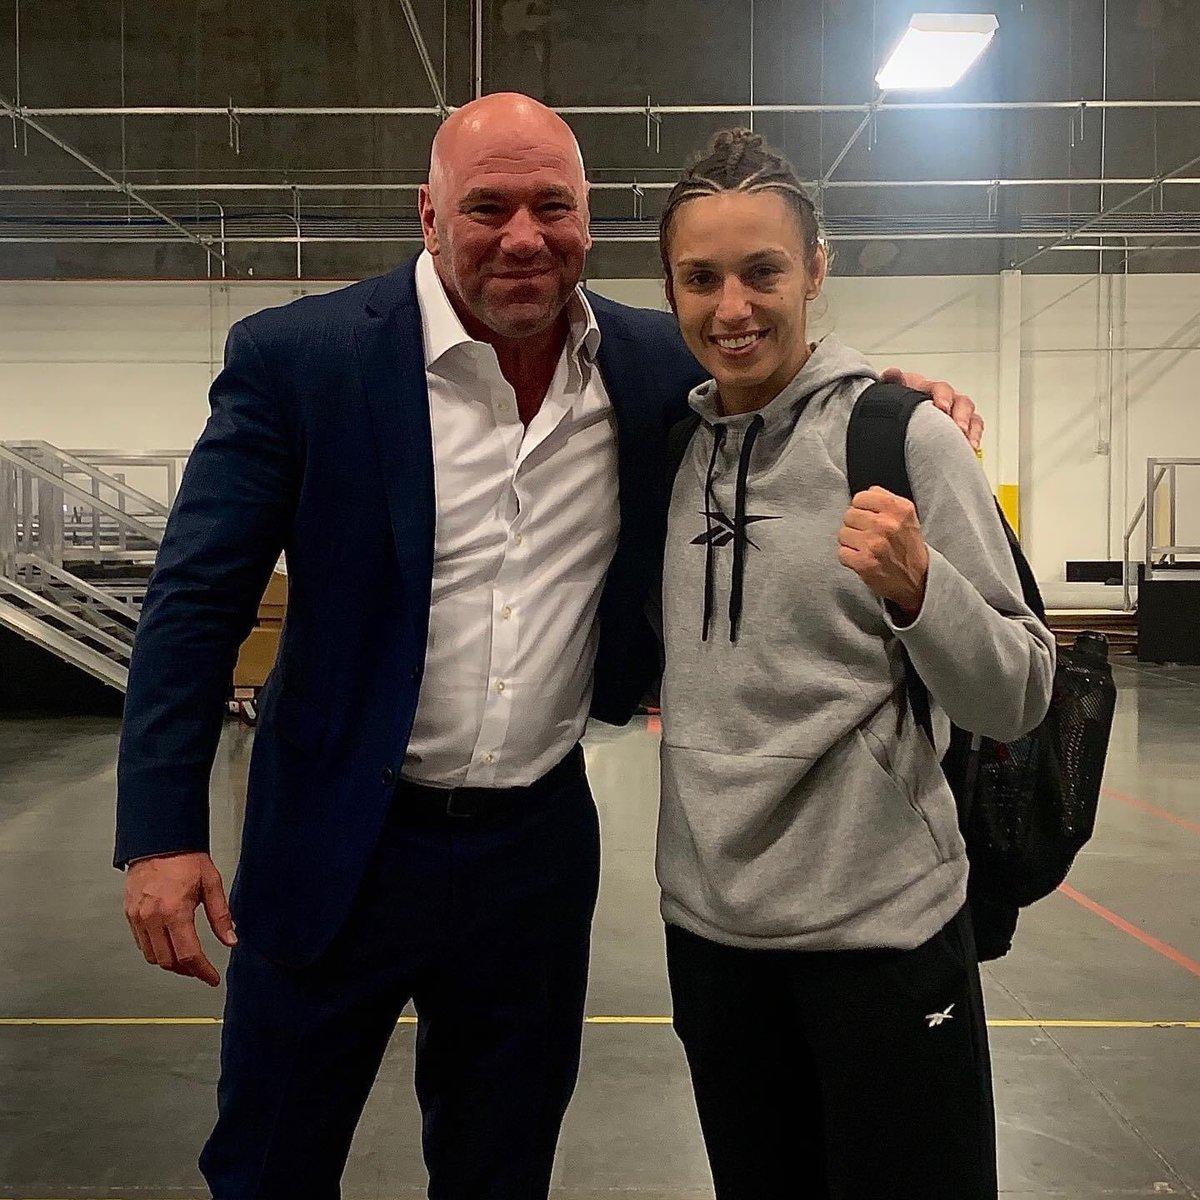 With @danawhite 💪🏻💪🏻 #UFC255